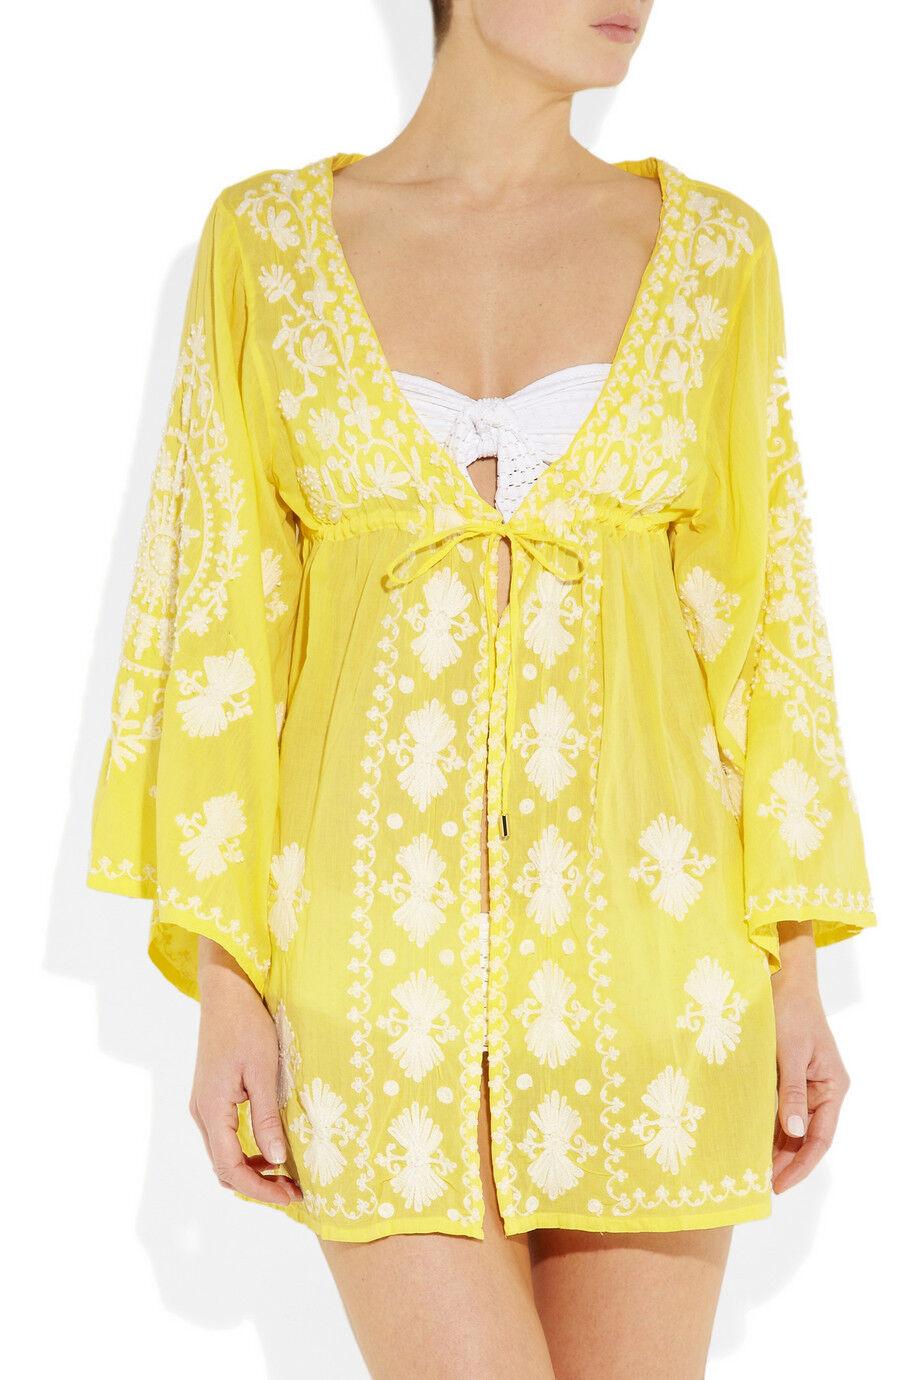 MELISSA ODABASH Yellow Embroidered Voile Cover Up Beach Dress Kaftan Bikini BNWT